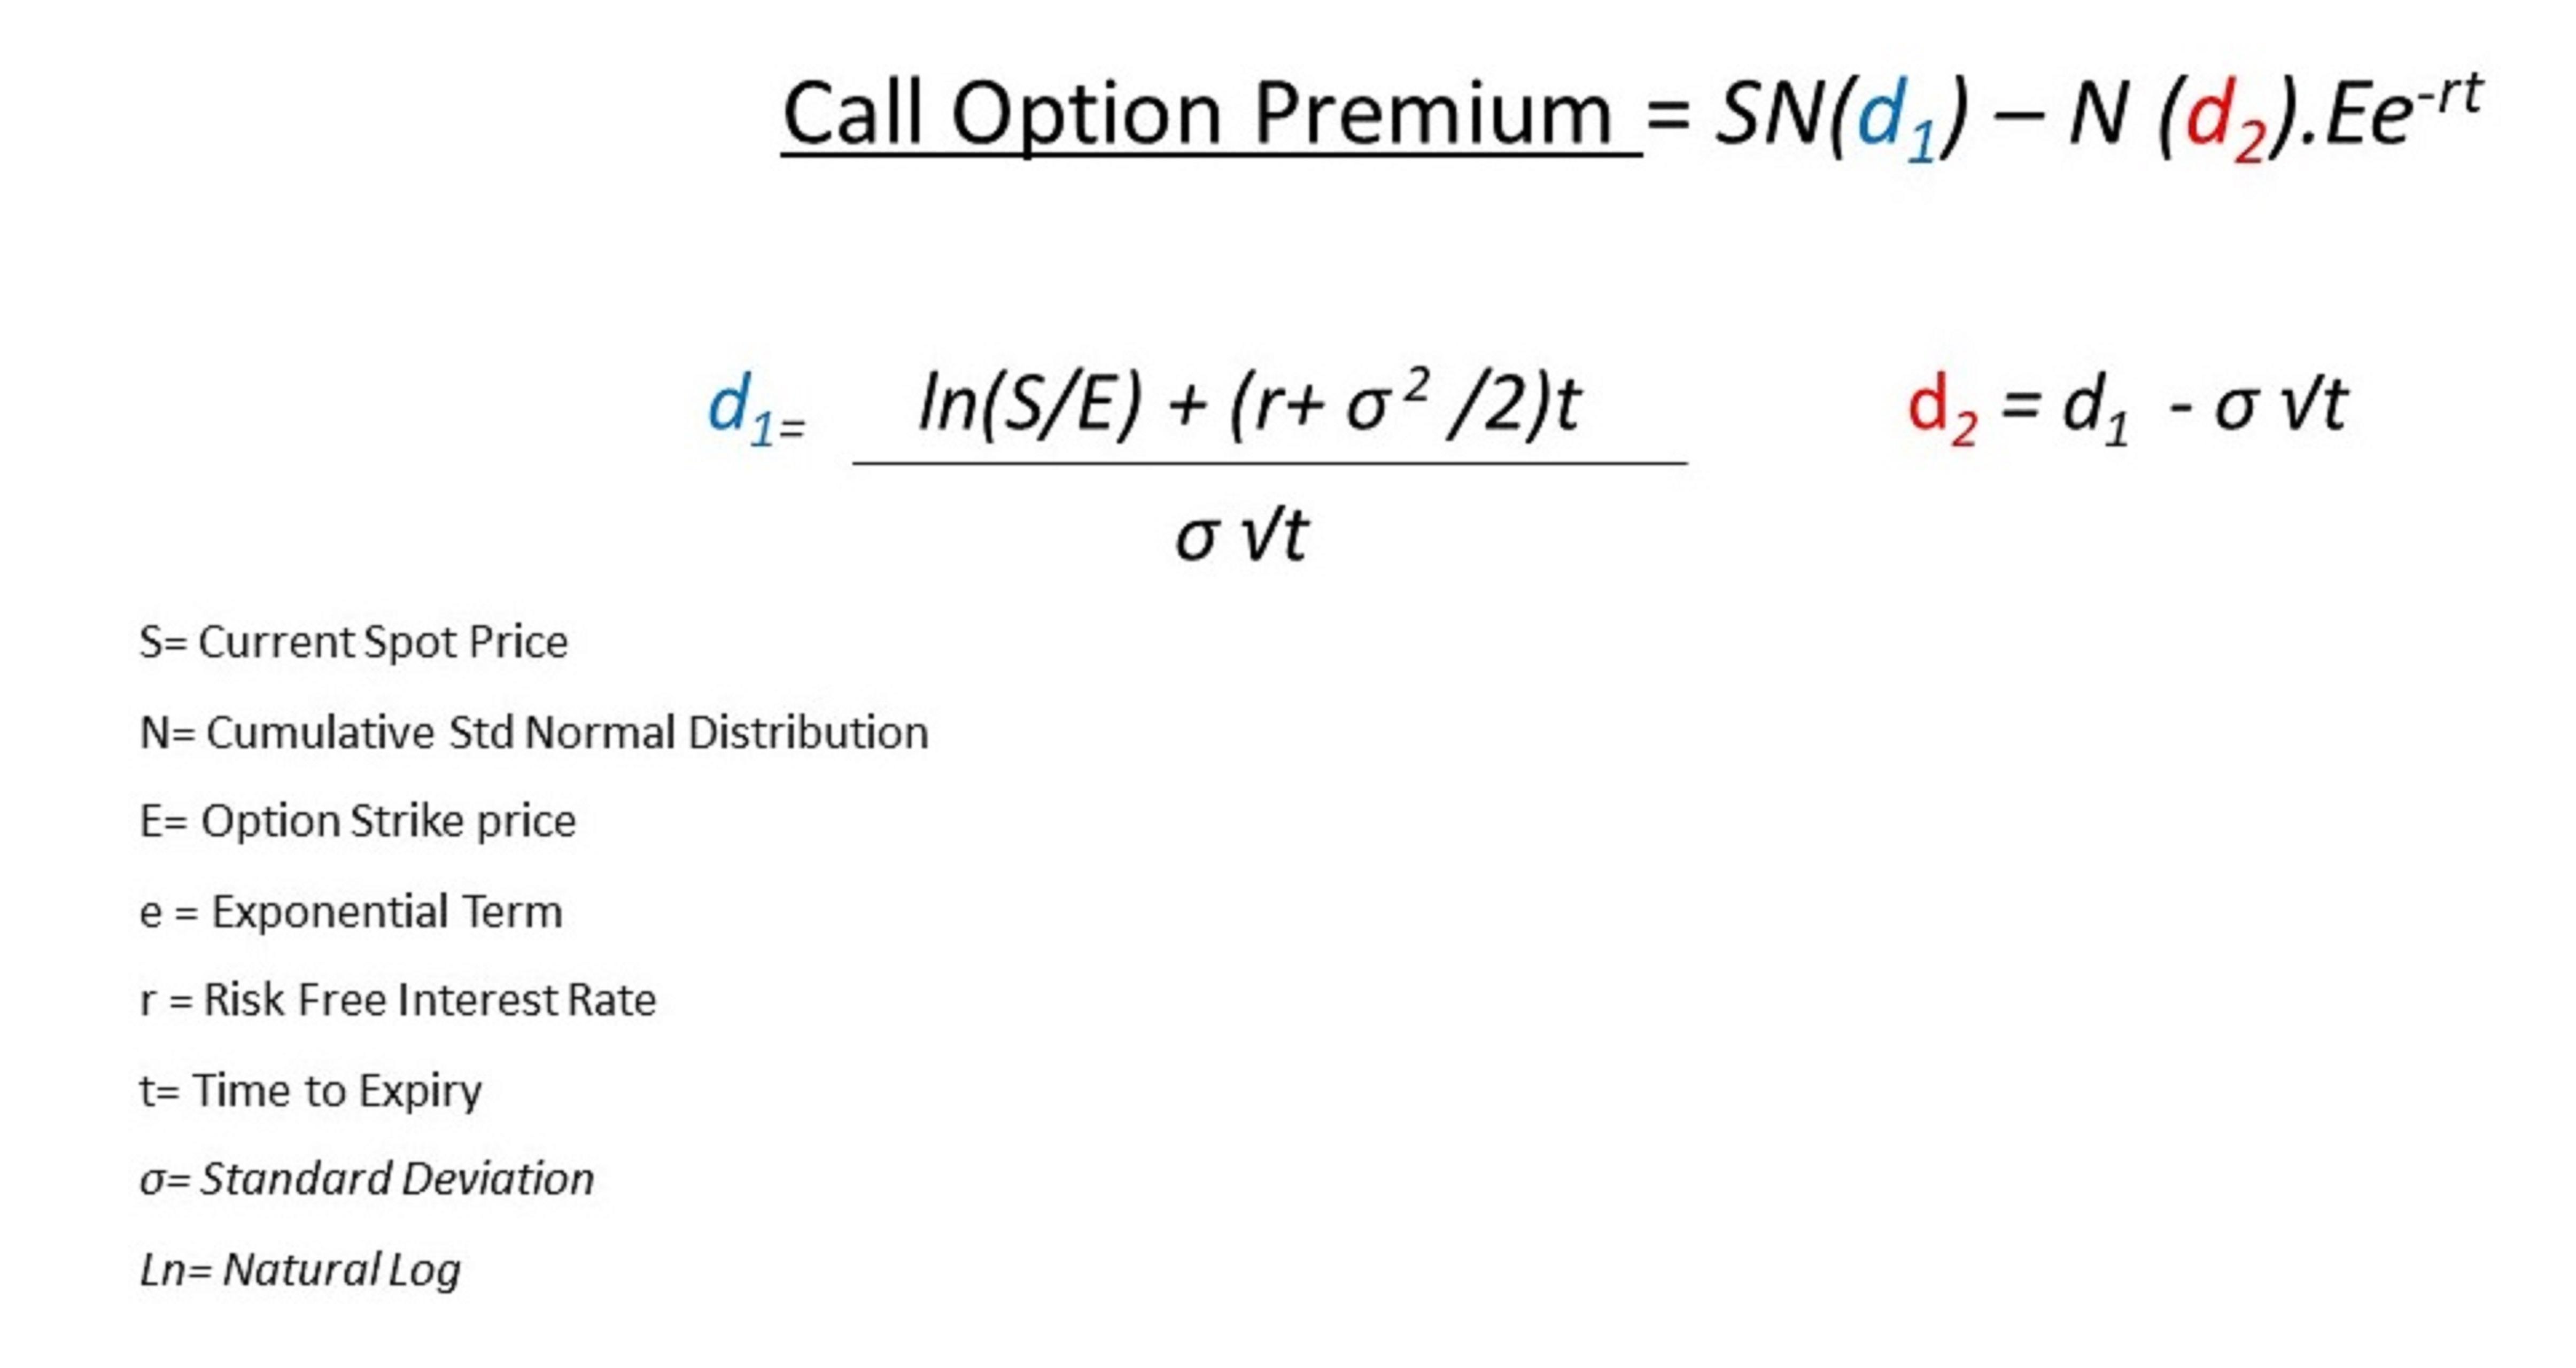 Black and Scholes Model Formula for Option Pricing